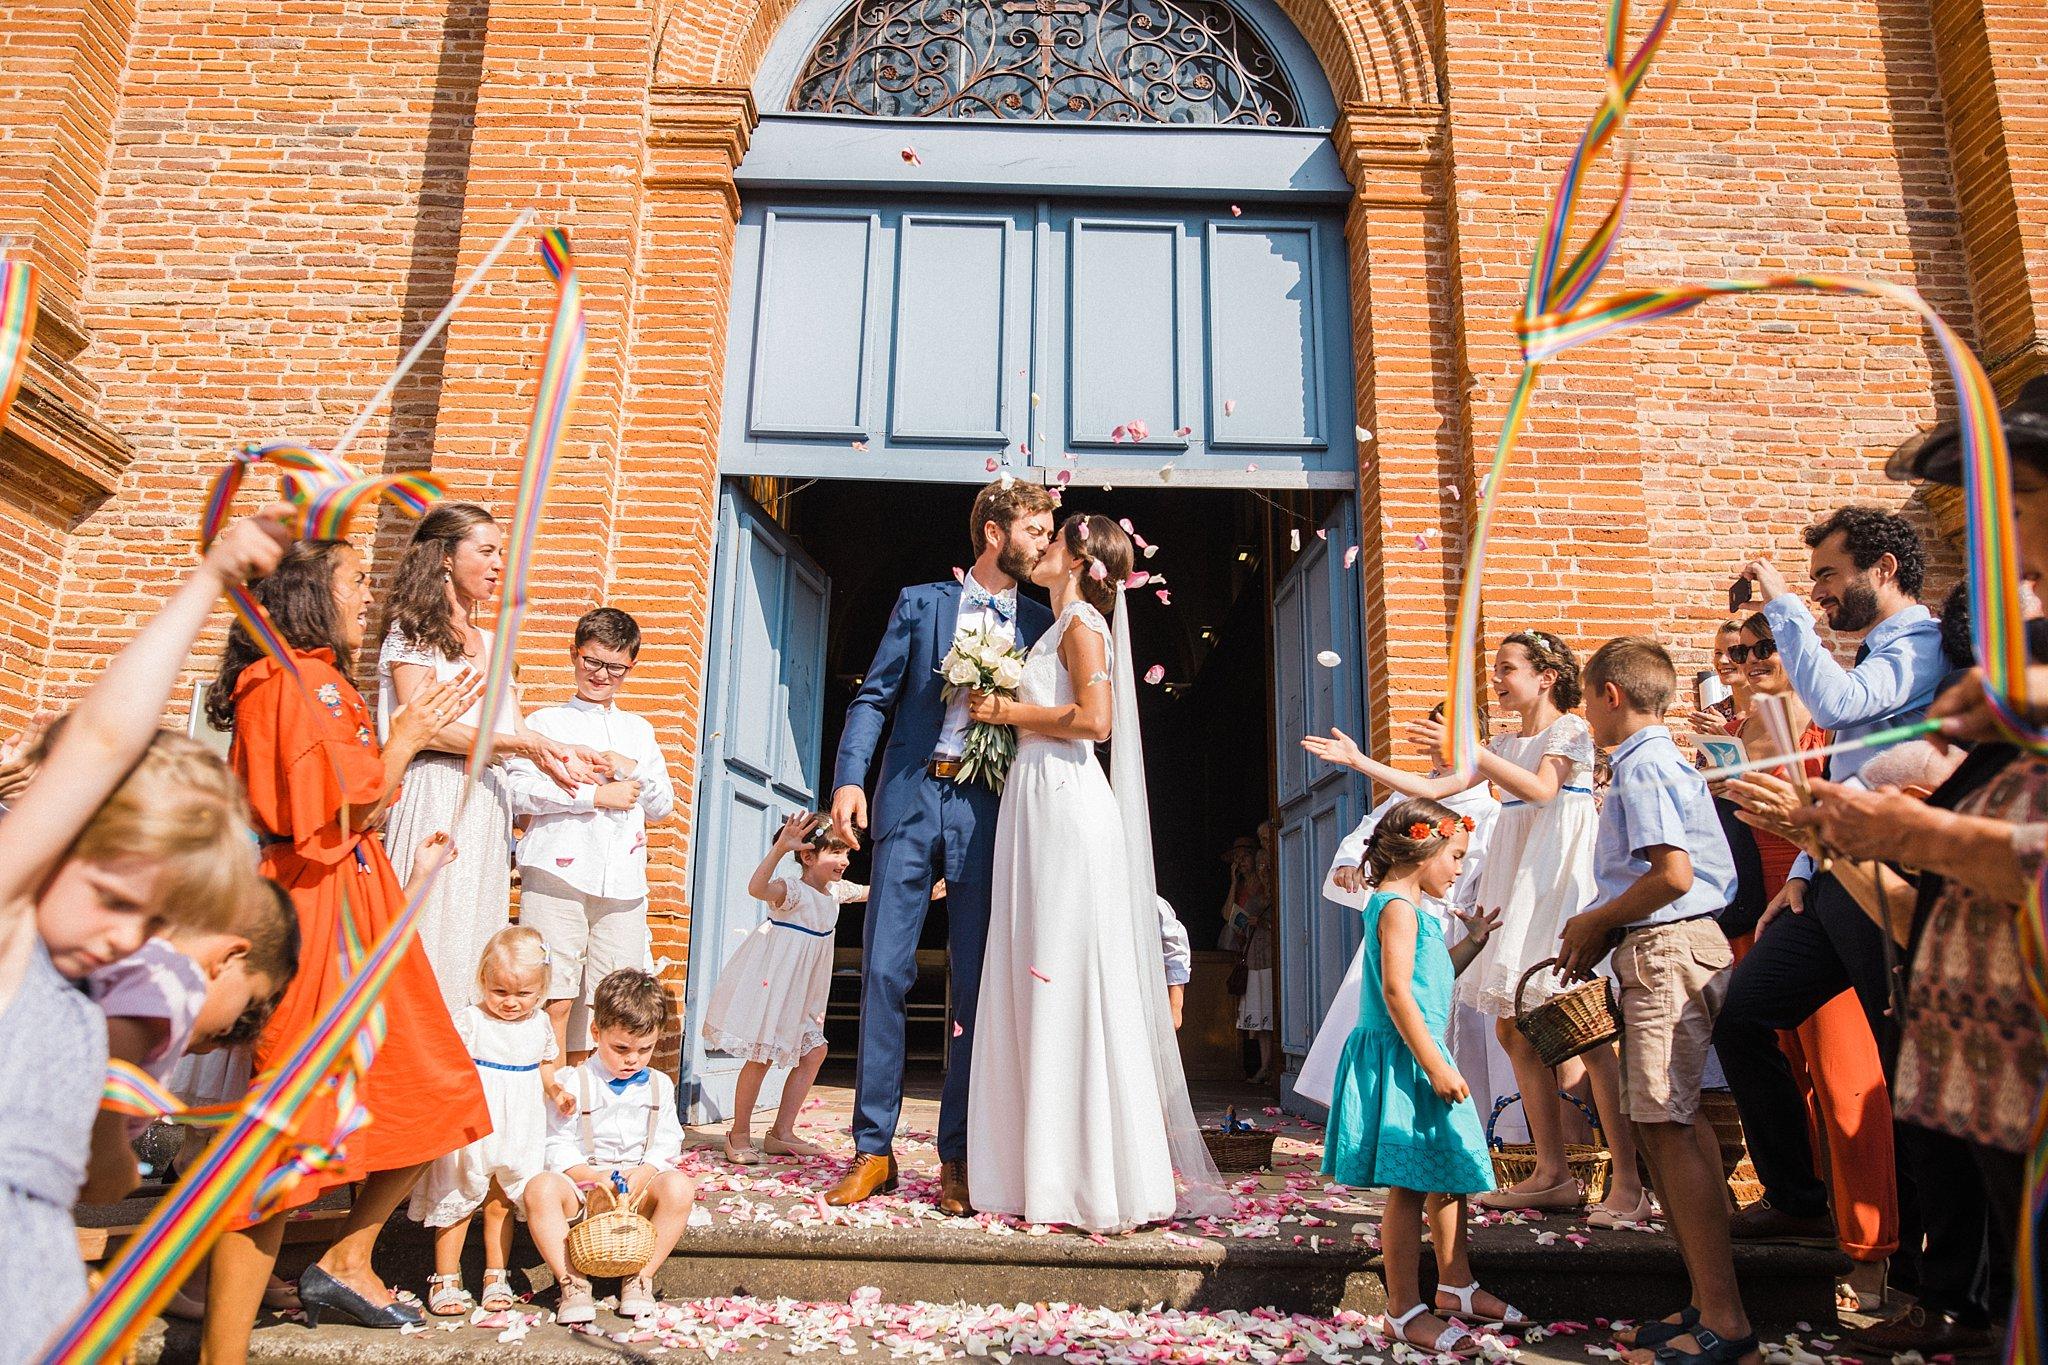 Mariage-a-la-maison-secall-hugo-hennequin-photographe-mariage-perpignan_0090.jpg